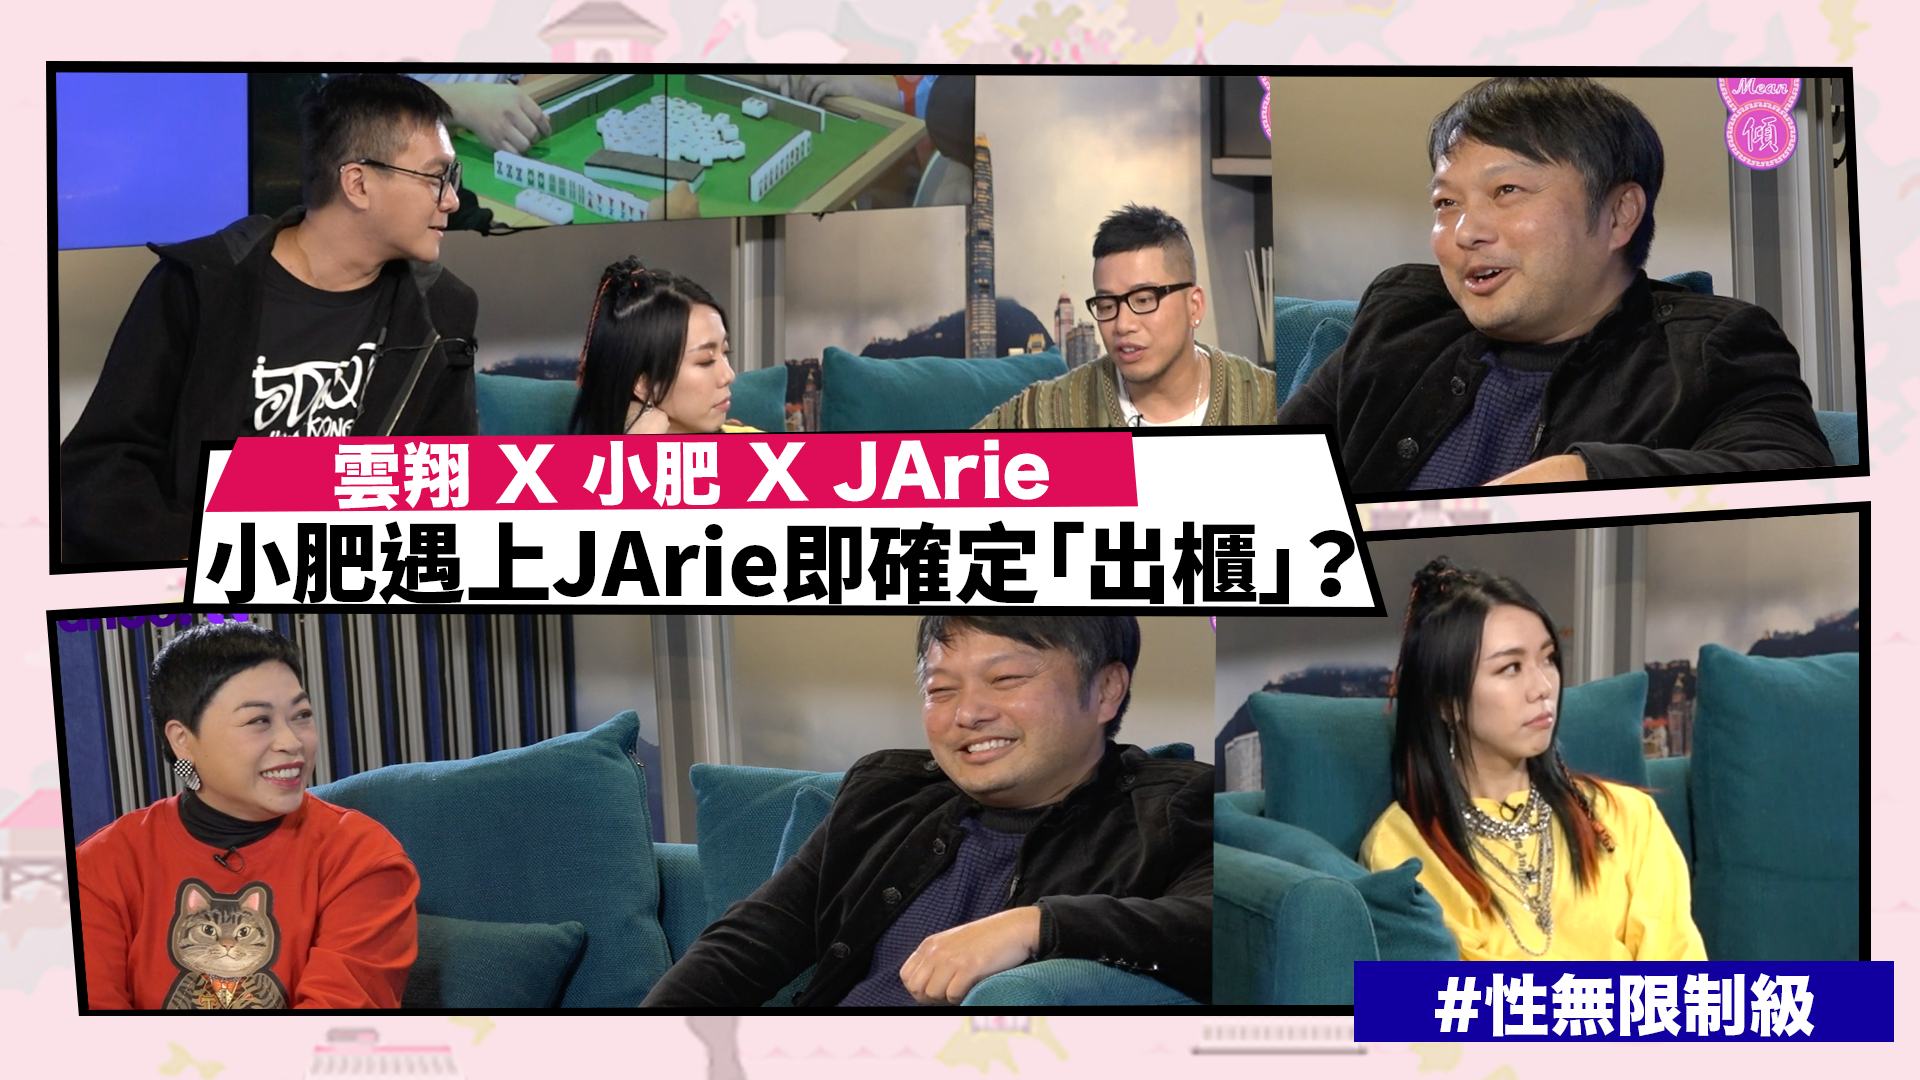 【Mean傾 第四季】盧覓雪 x 梁栢堅 #性無限制級 小肥遇上JArie即確定「出櫃」?